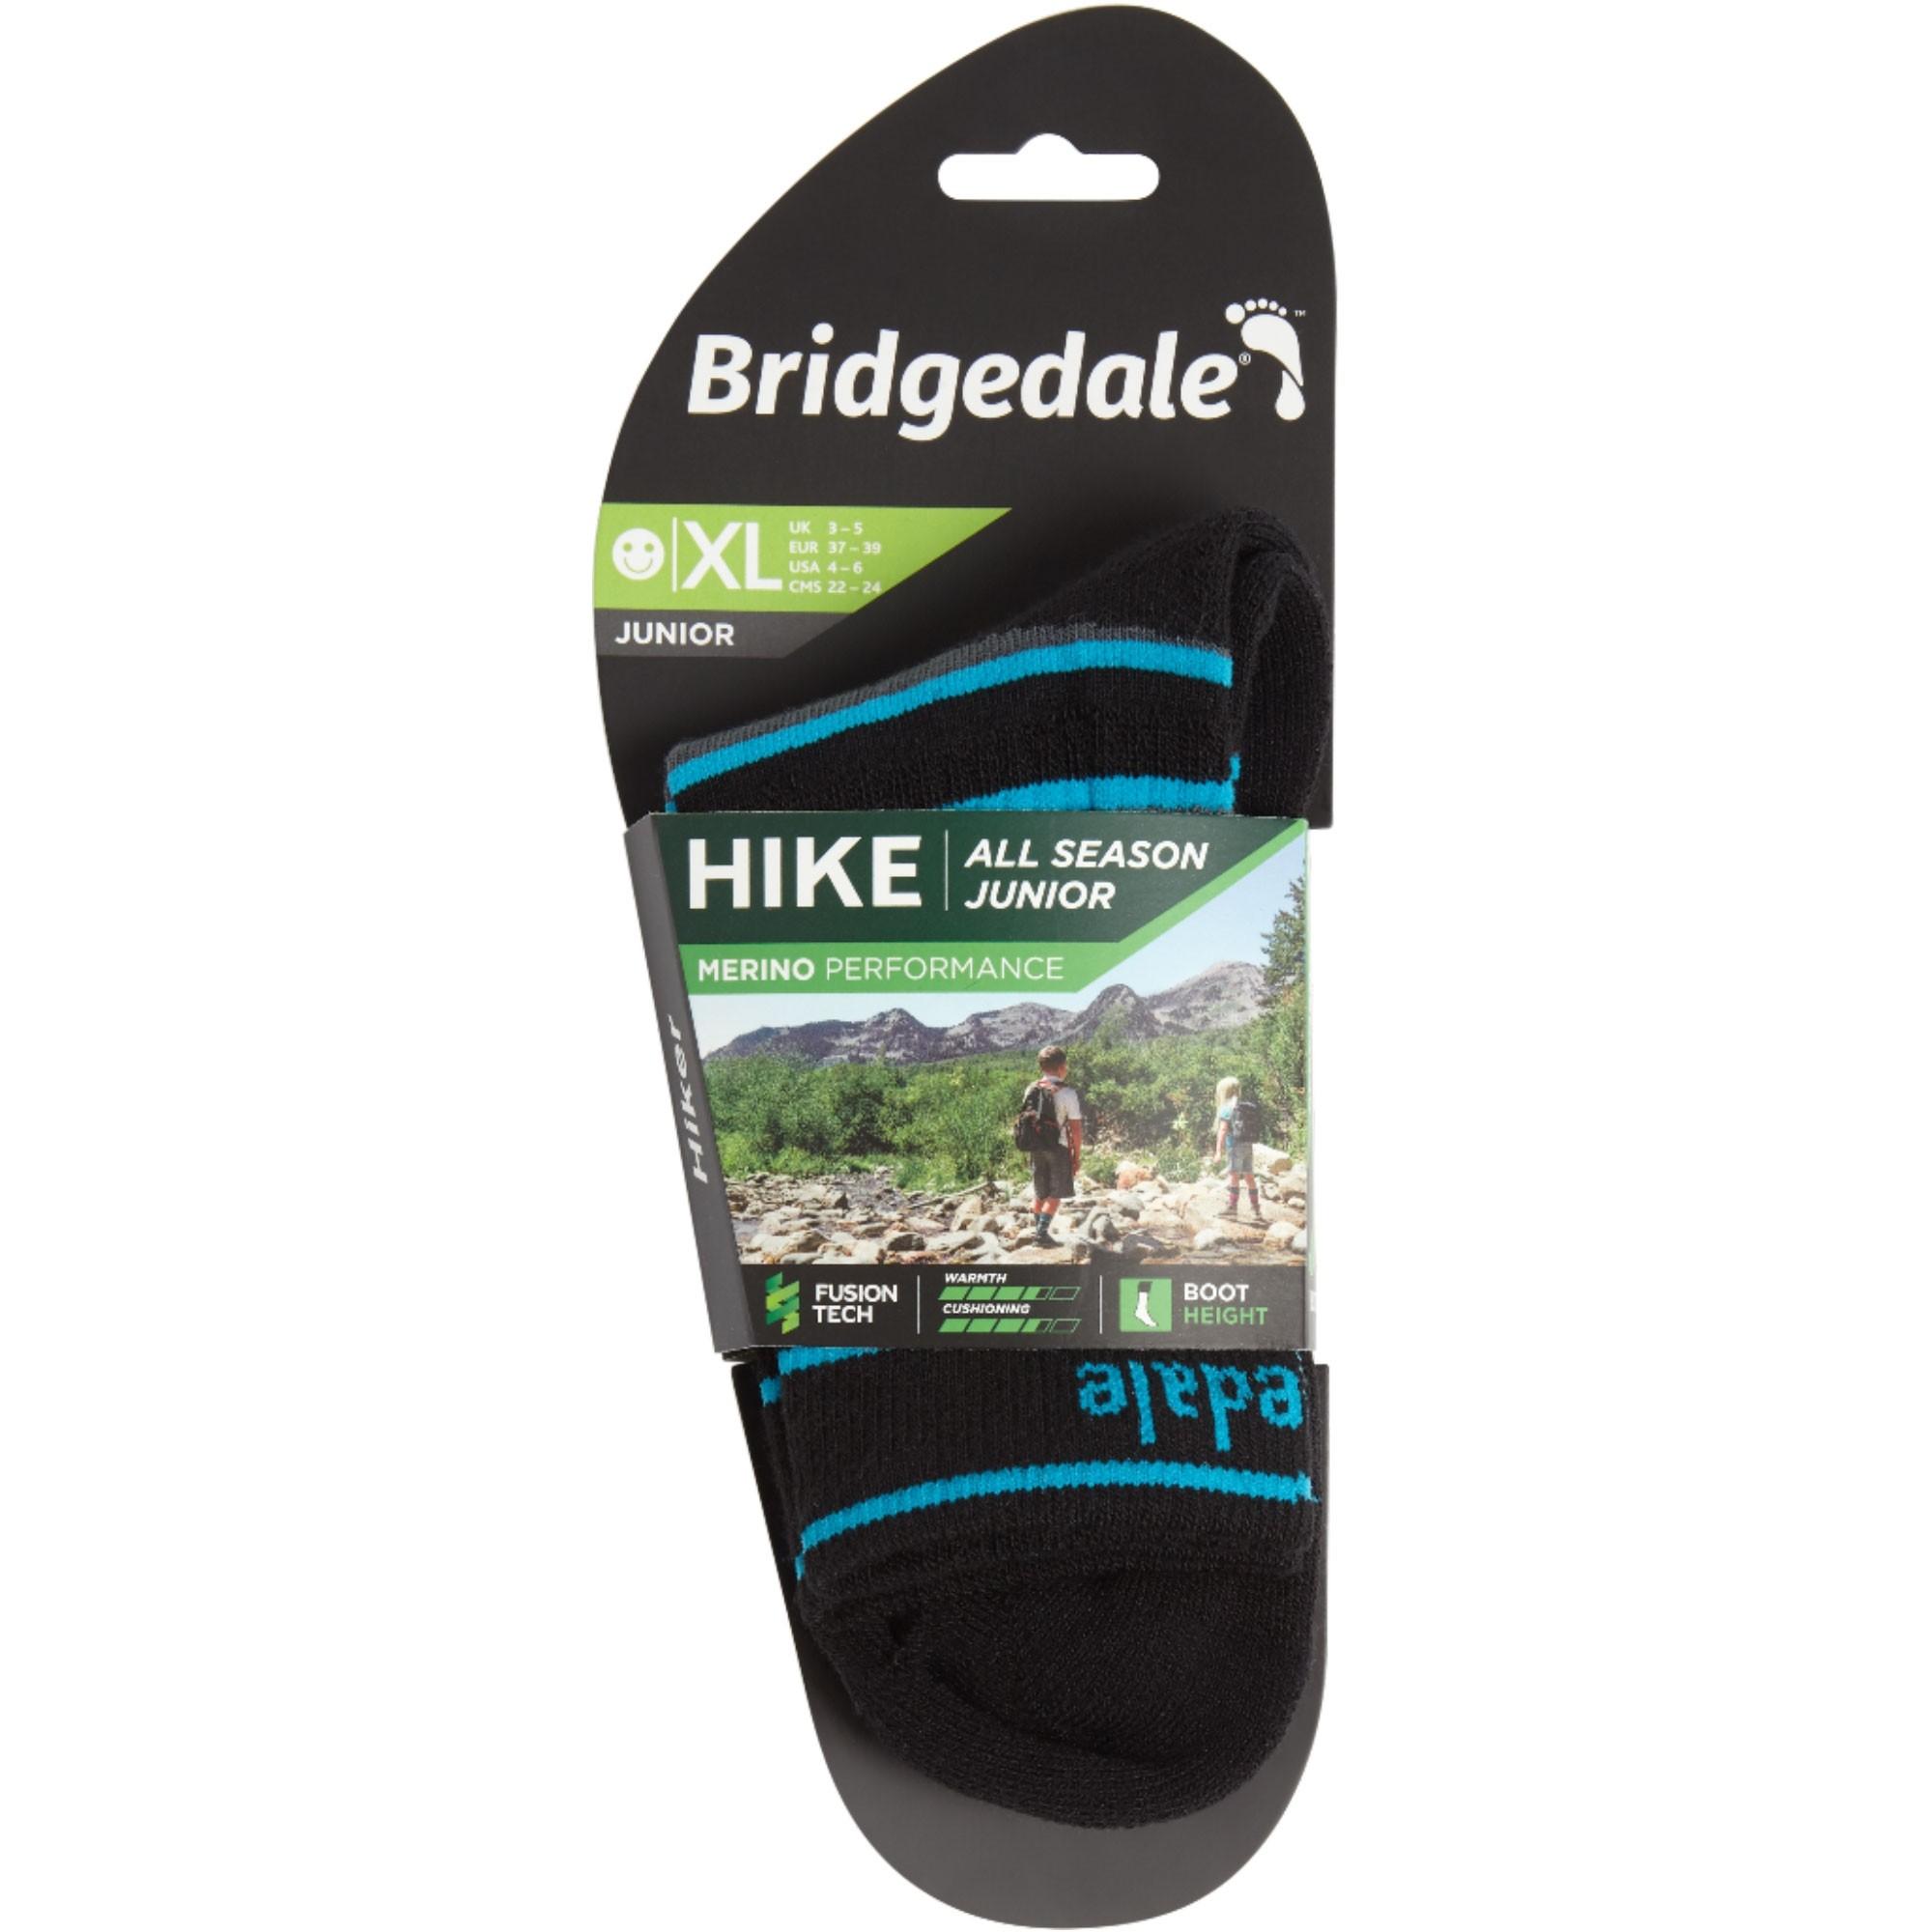 Bridgedale HIKE Junior All Season Merino Performance Socks  - Black/Grey